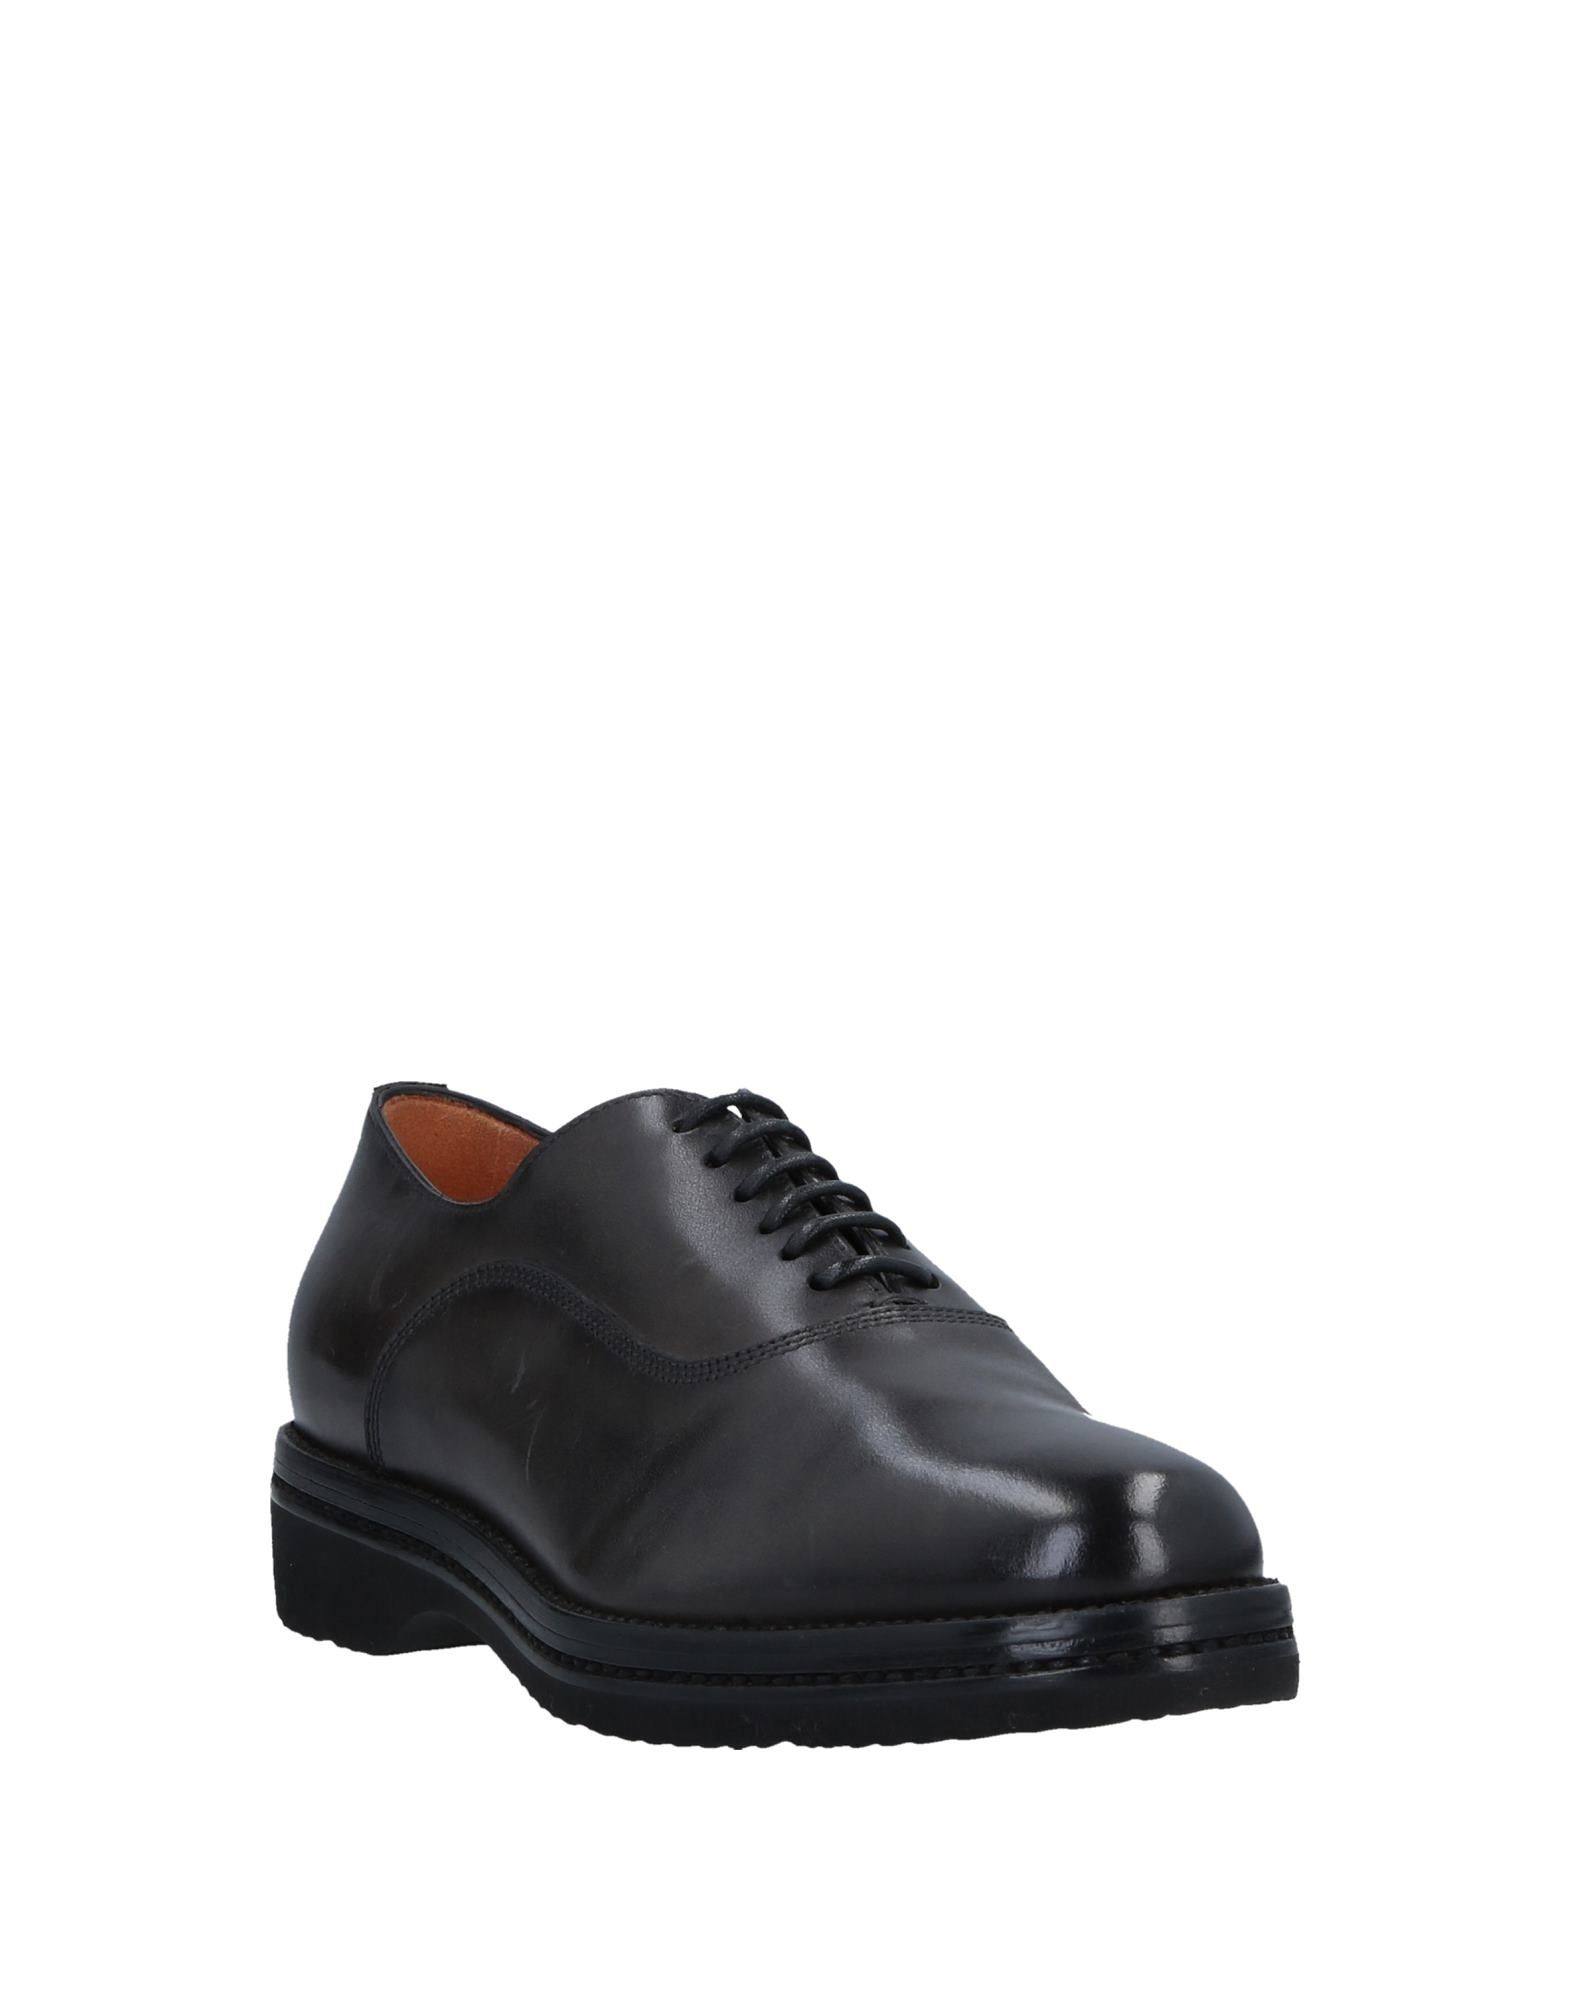 Santoni Schnürschuhe 11539196OFGünstige Damen  11539196OFGünstige Schnürschuhe gut aussehende Schuhe 2fa78b